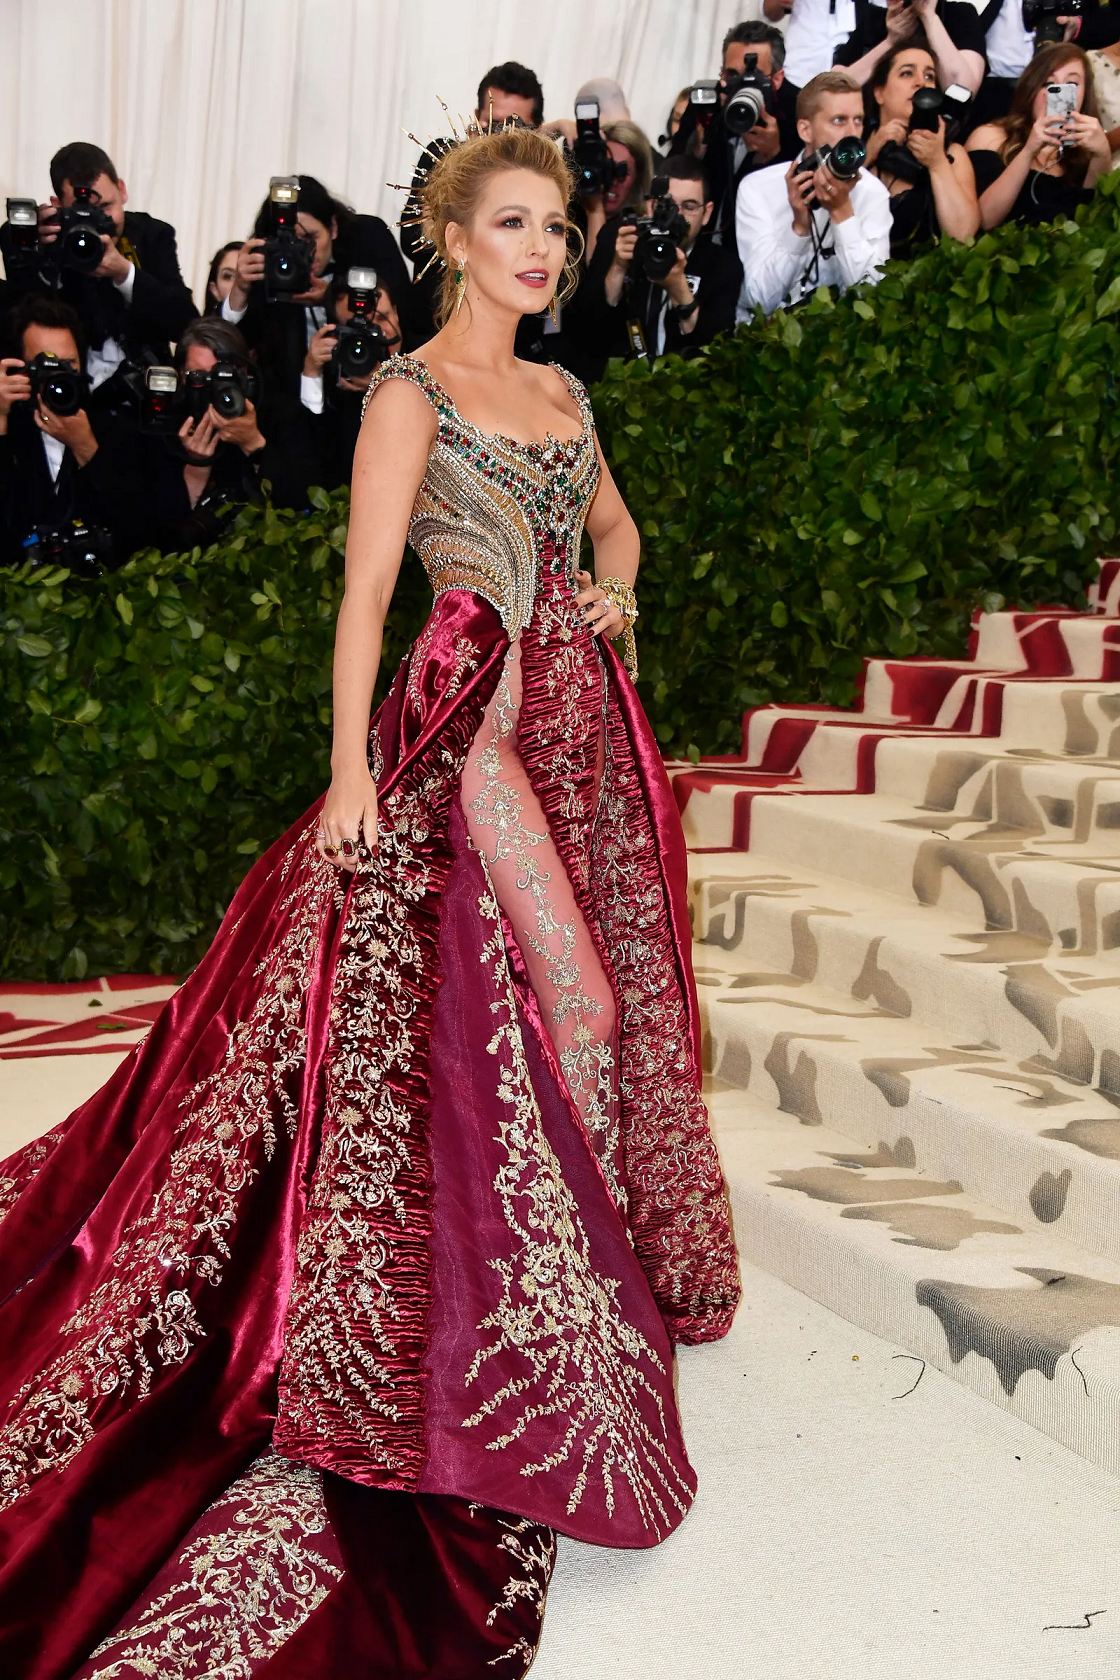 Best bling dresses online 2021 Richly Embellished Burgundy Dress with An Embroidered Skirt